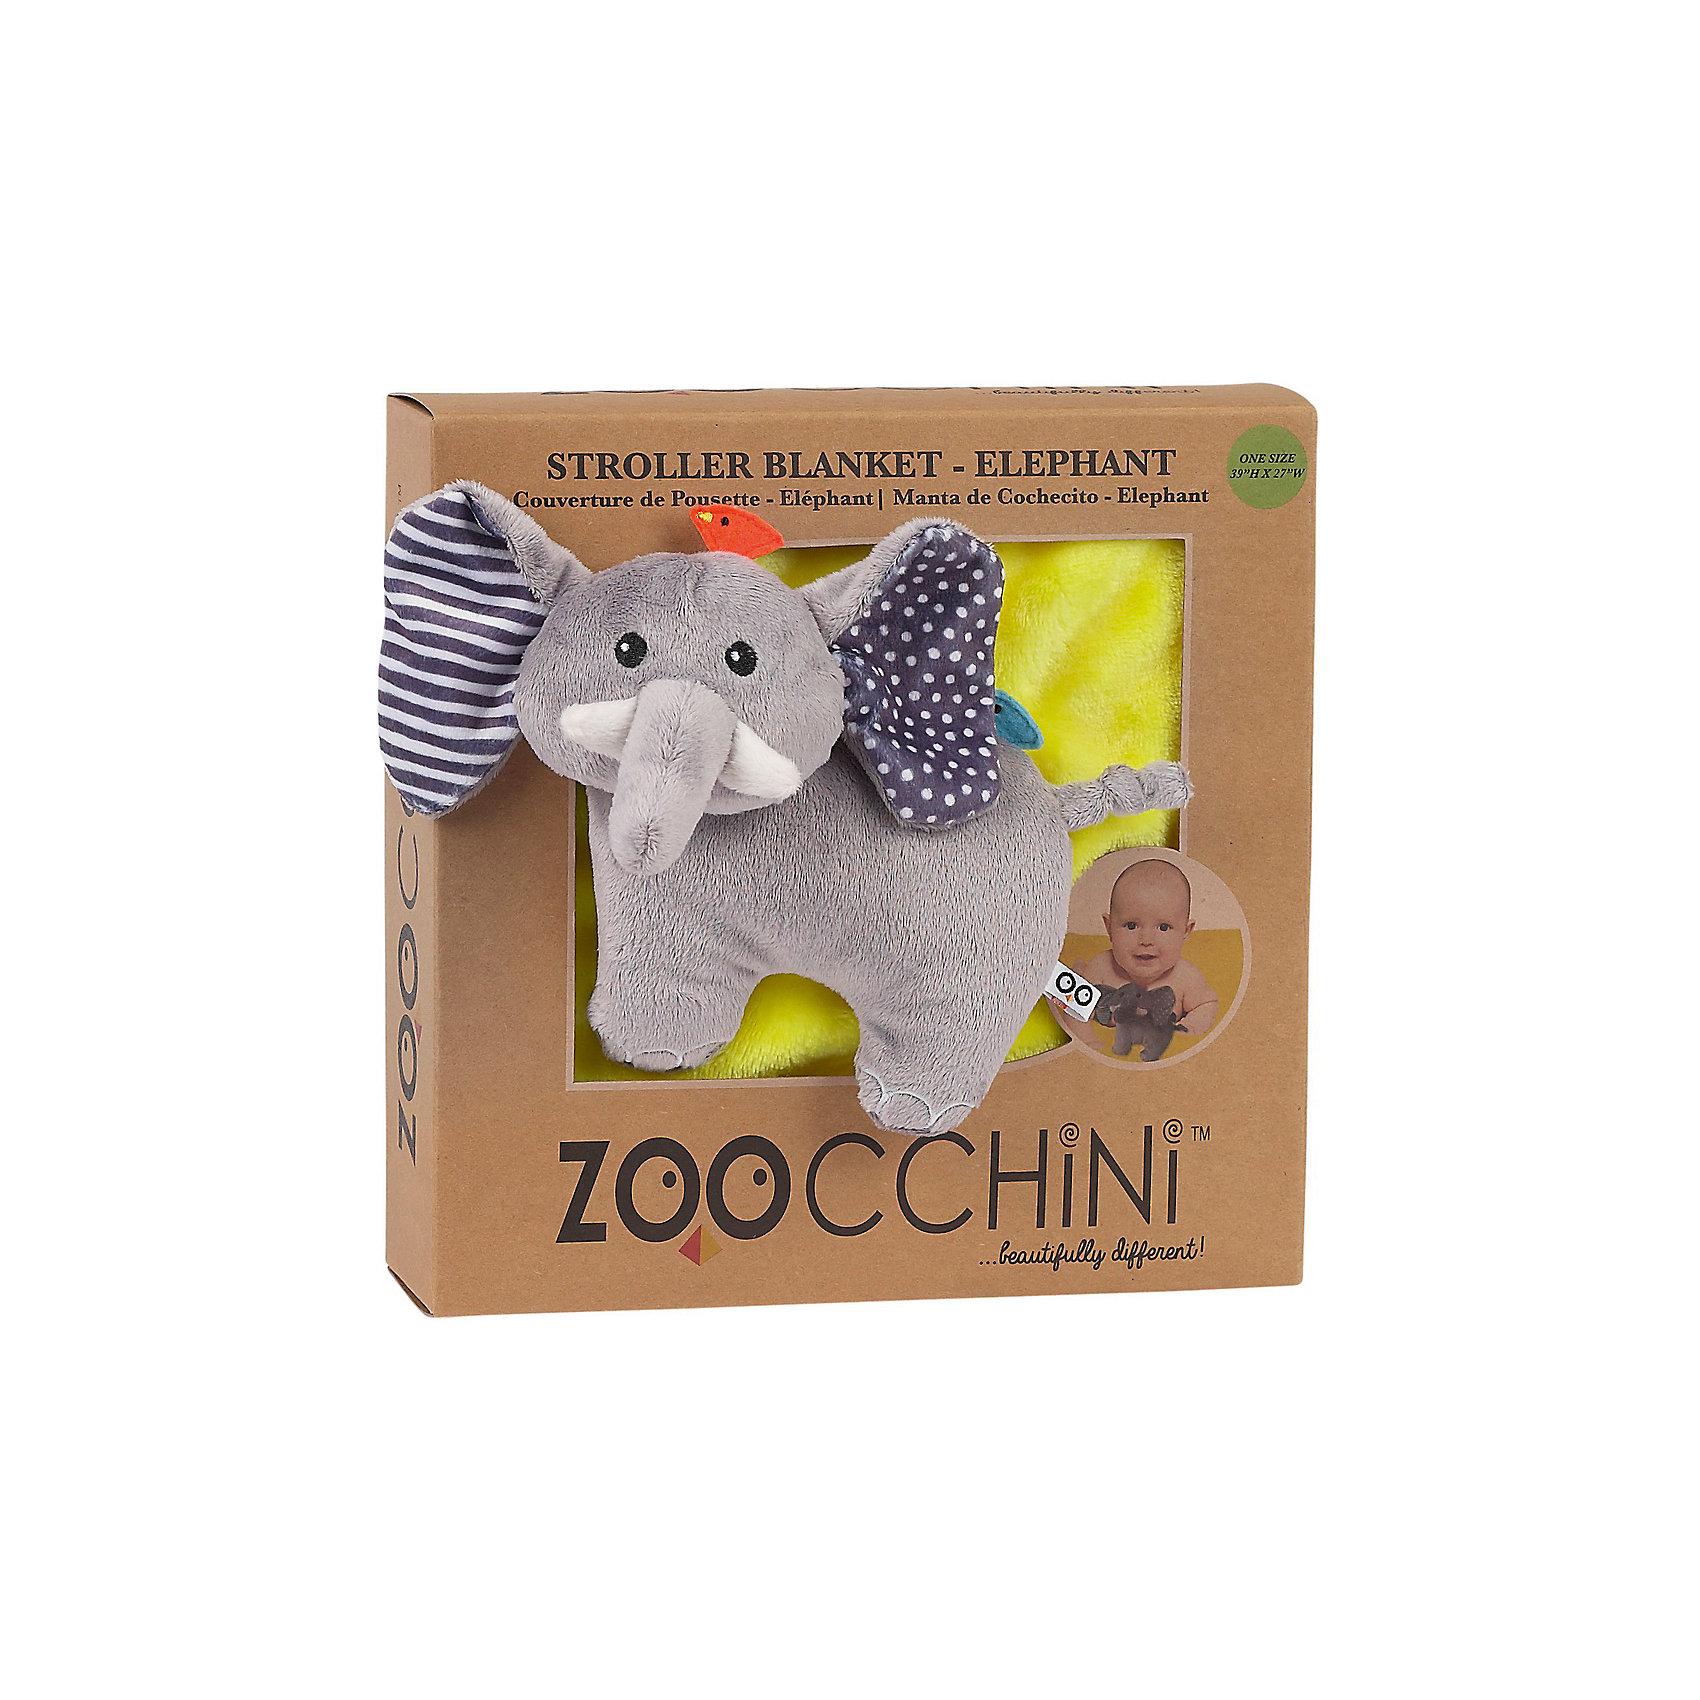 ������ � �������� ����, Zoocchini, �����